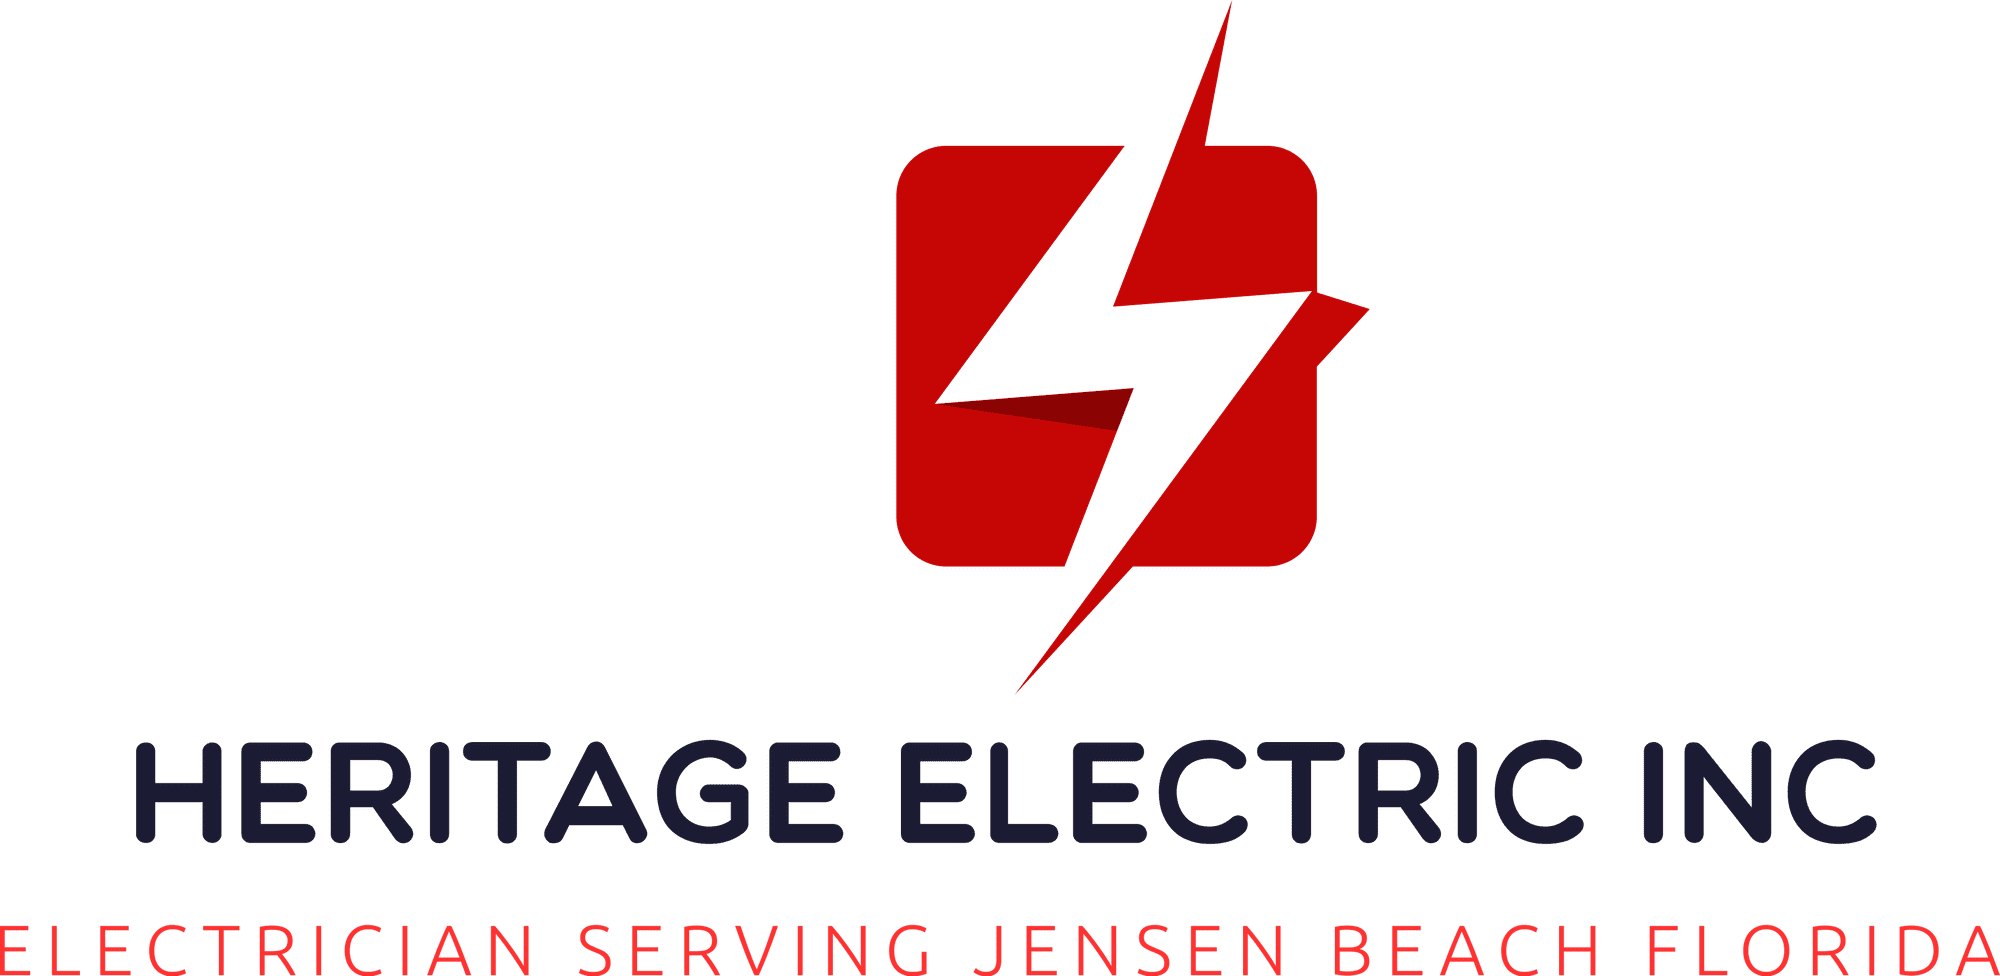 Heritage Electric Inc Jensen Beach